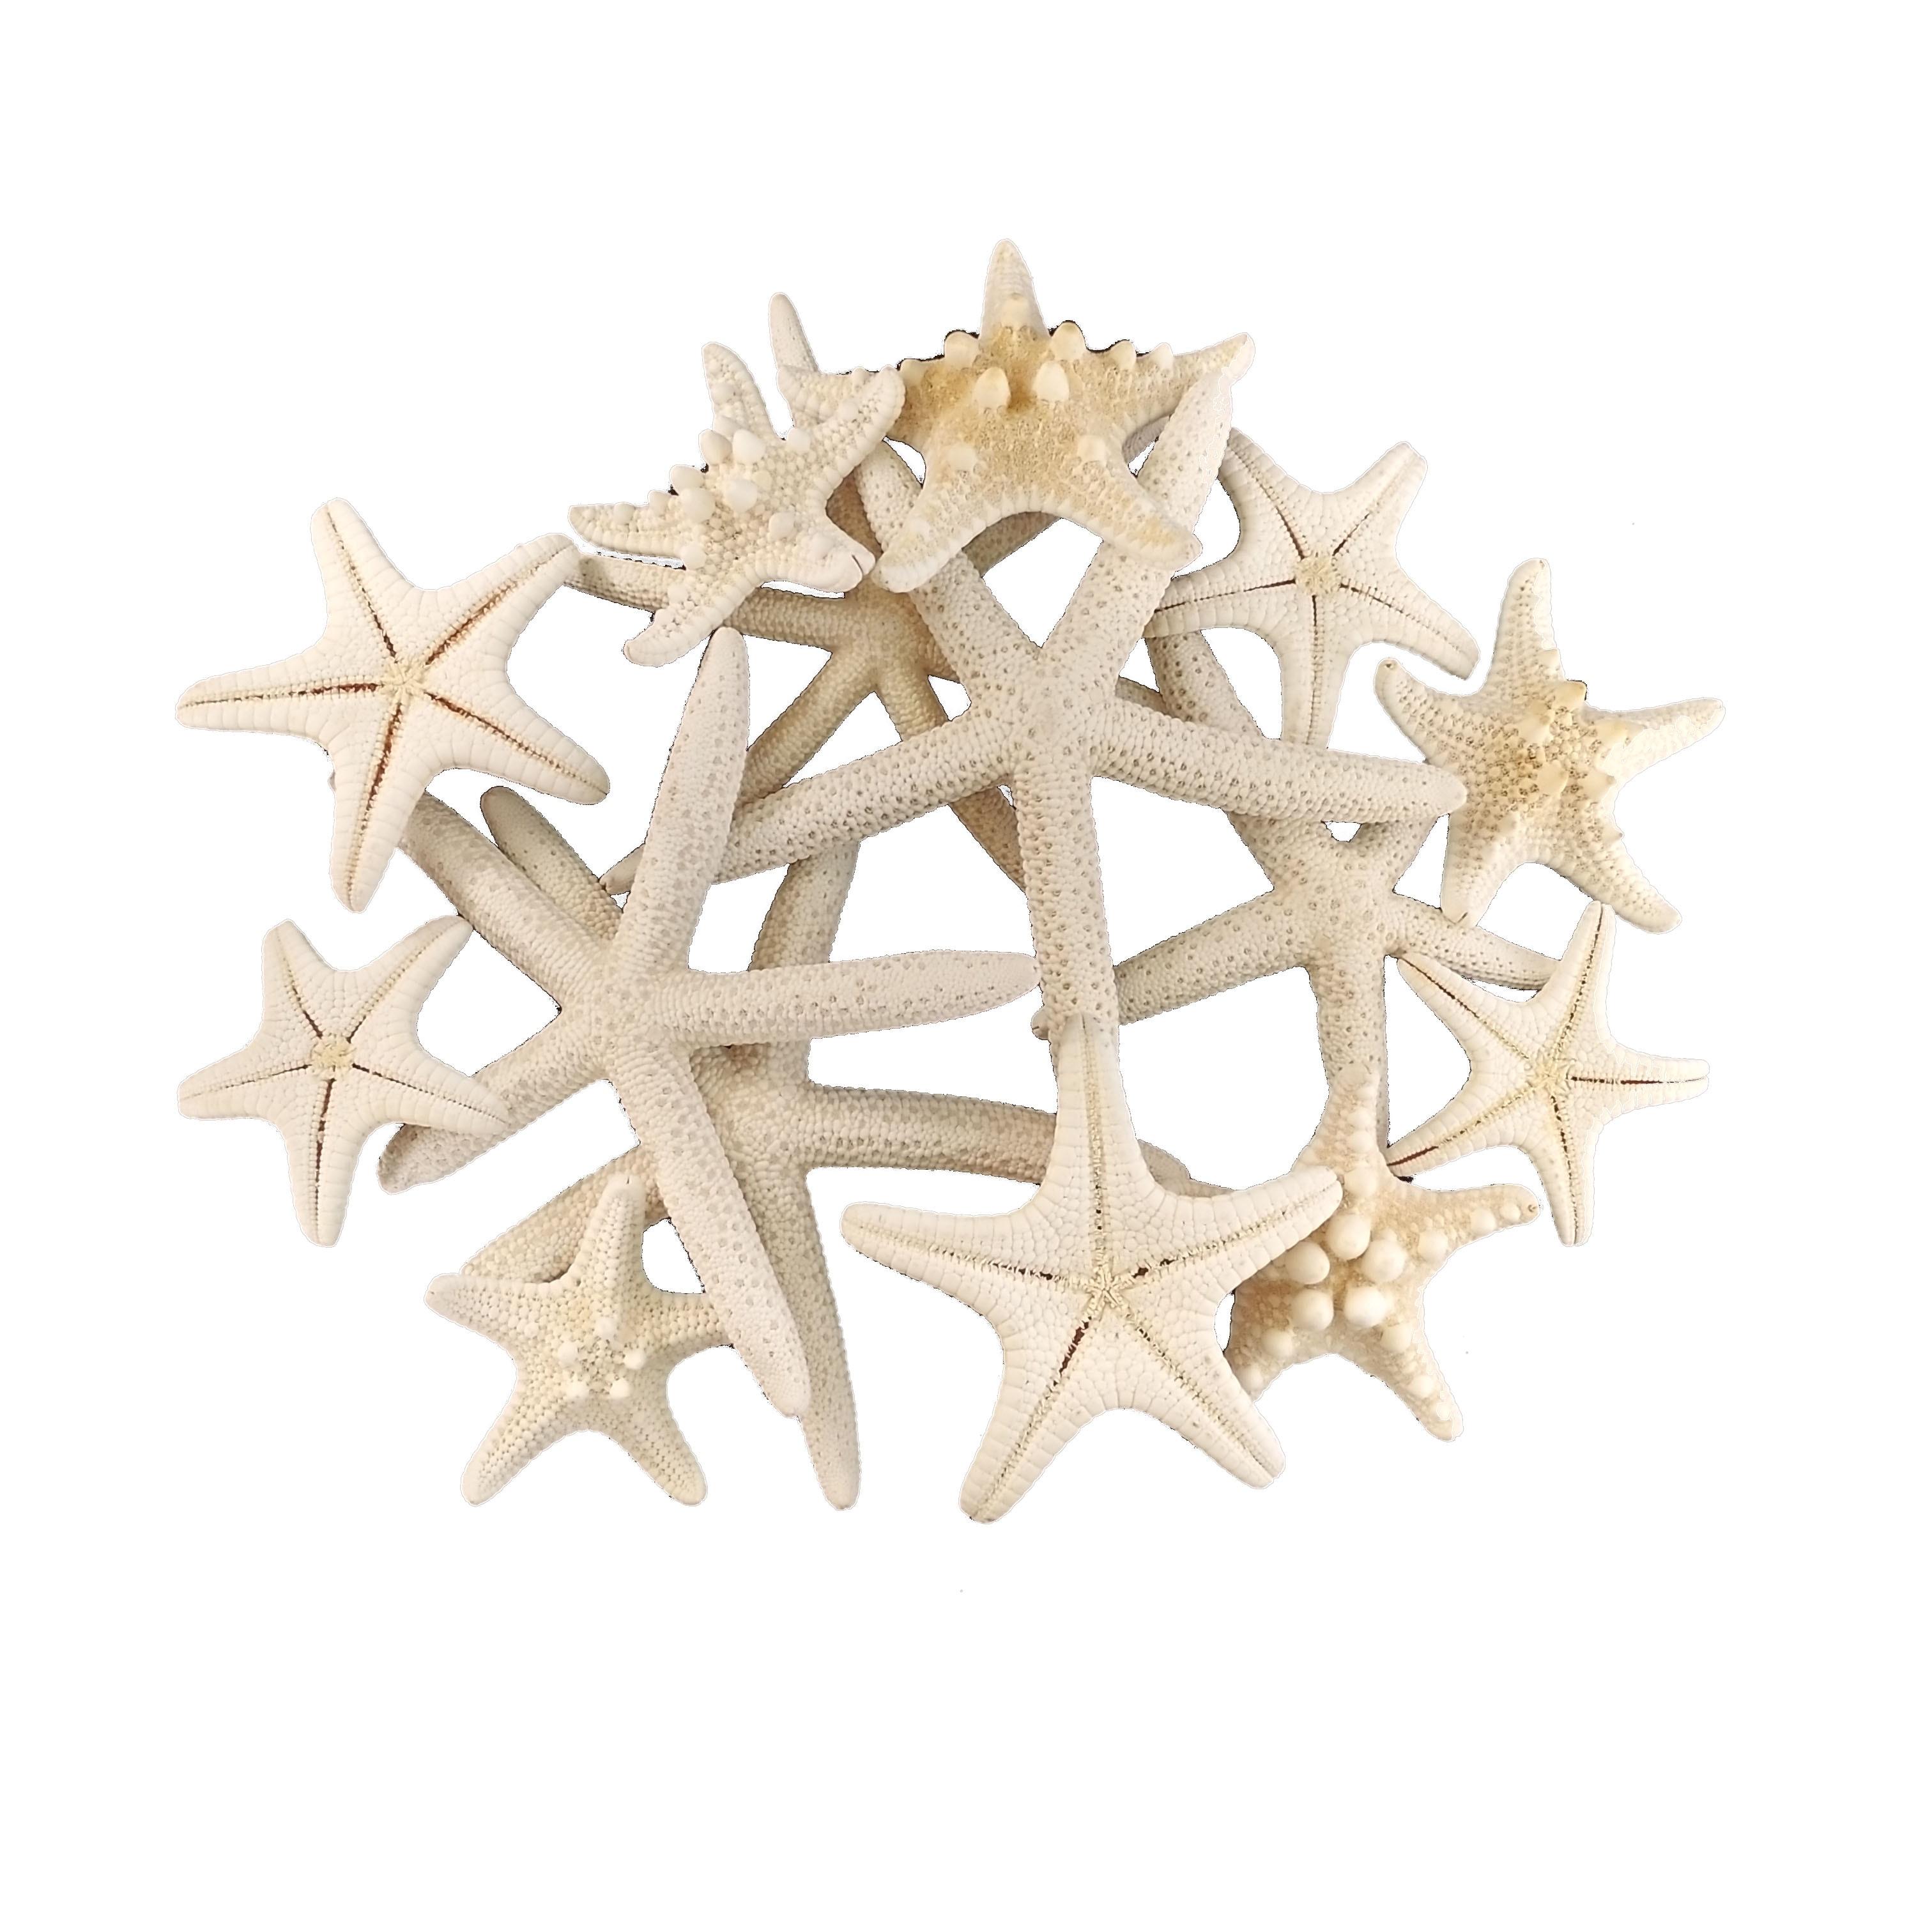 4-8cm 1-6Pcs White Starfish Craft Decoration Natural Finger Sea Star Wedding Decor Seashells Seafish Party Beige Seastar Crafts